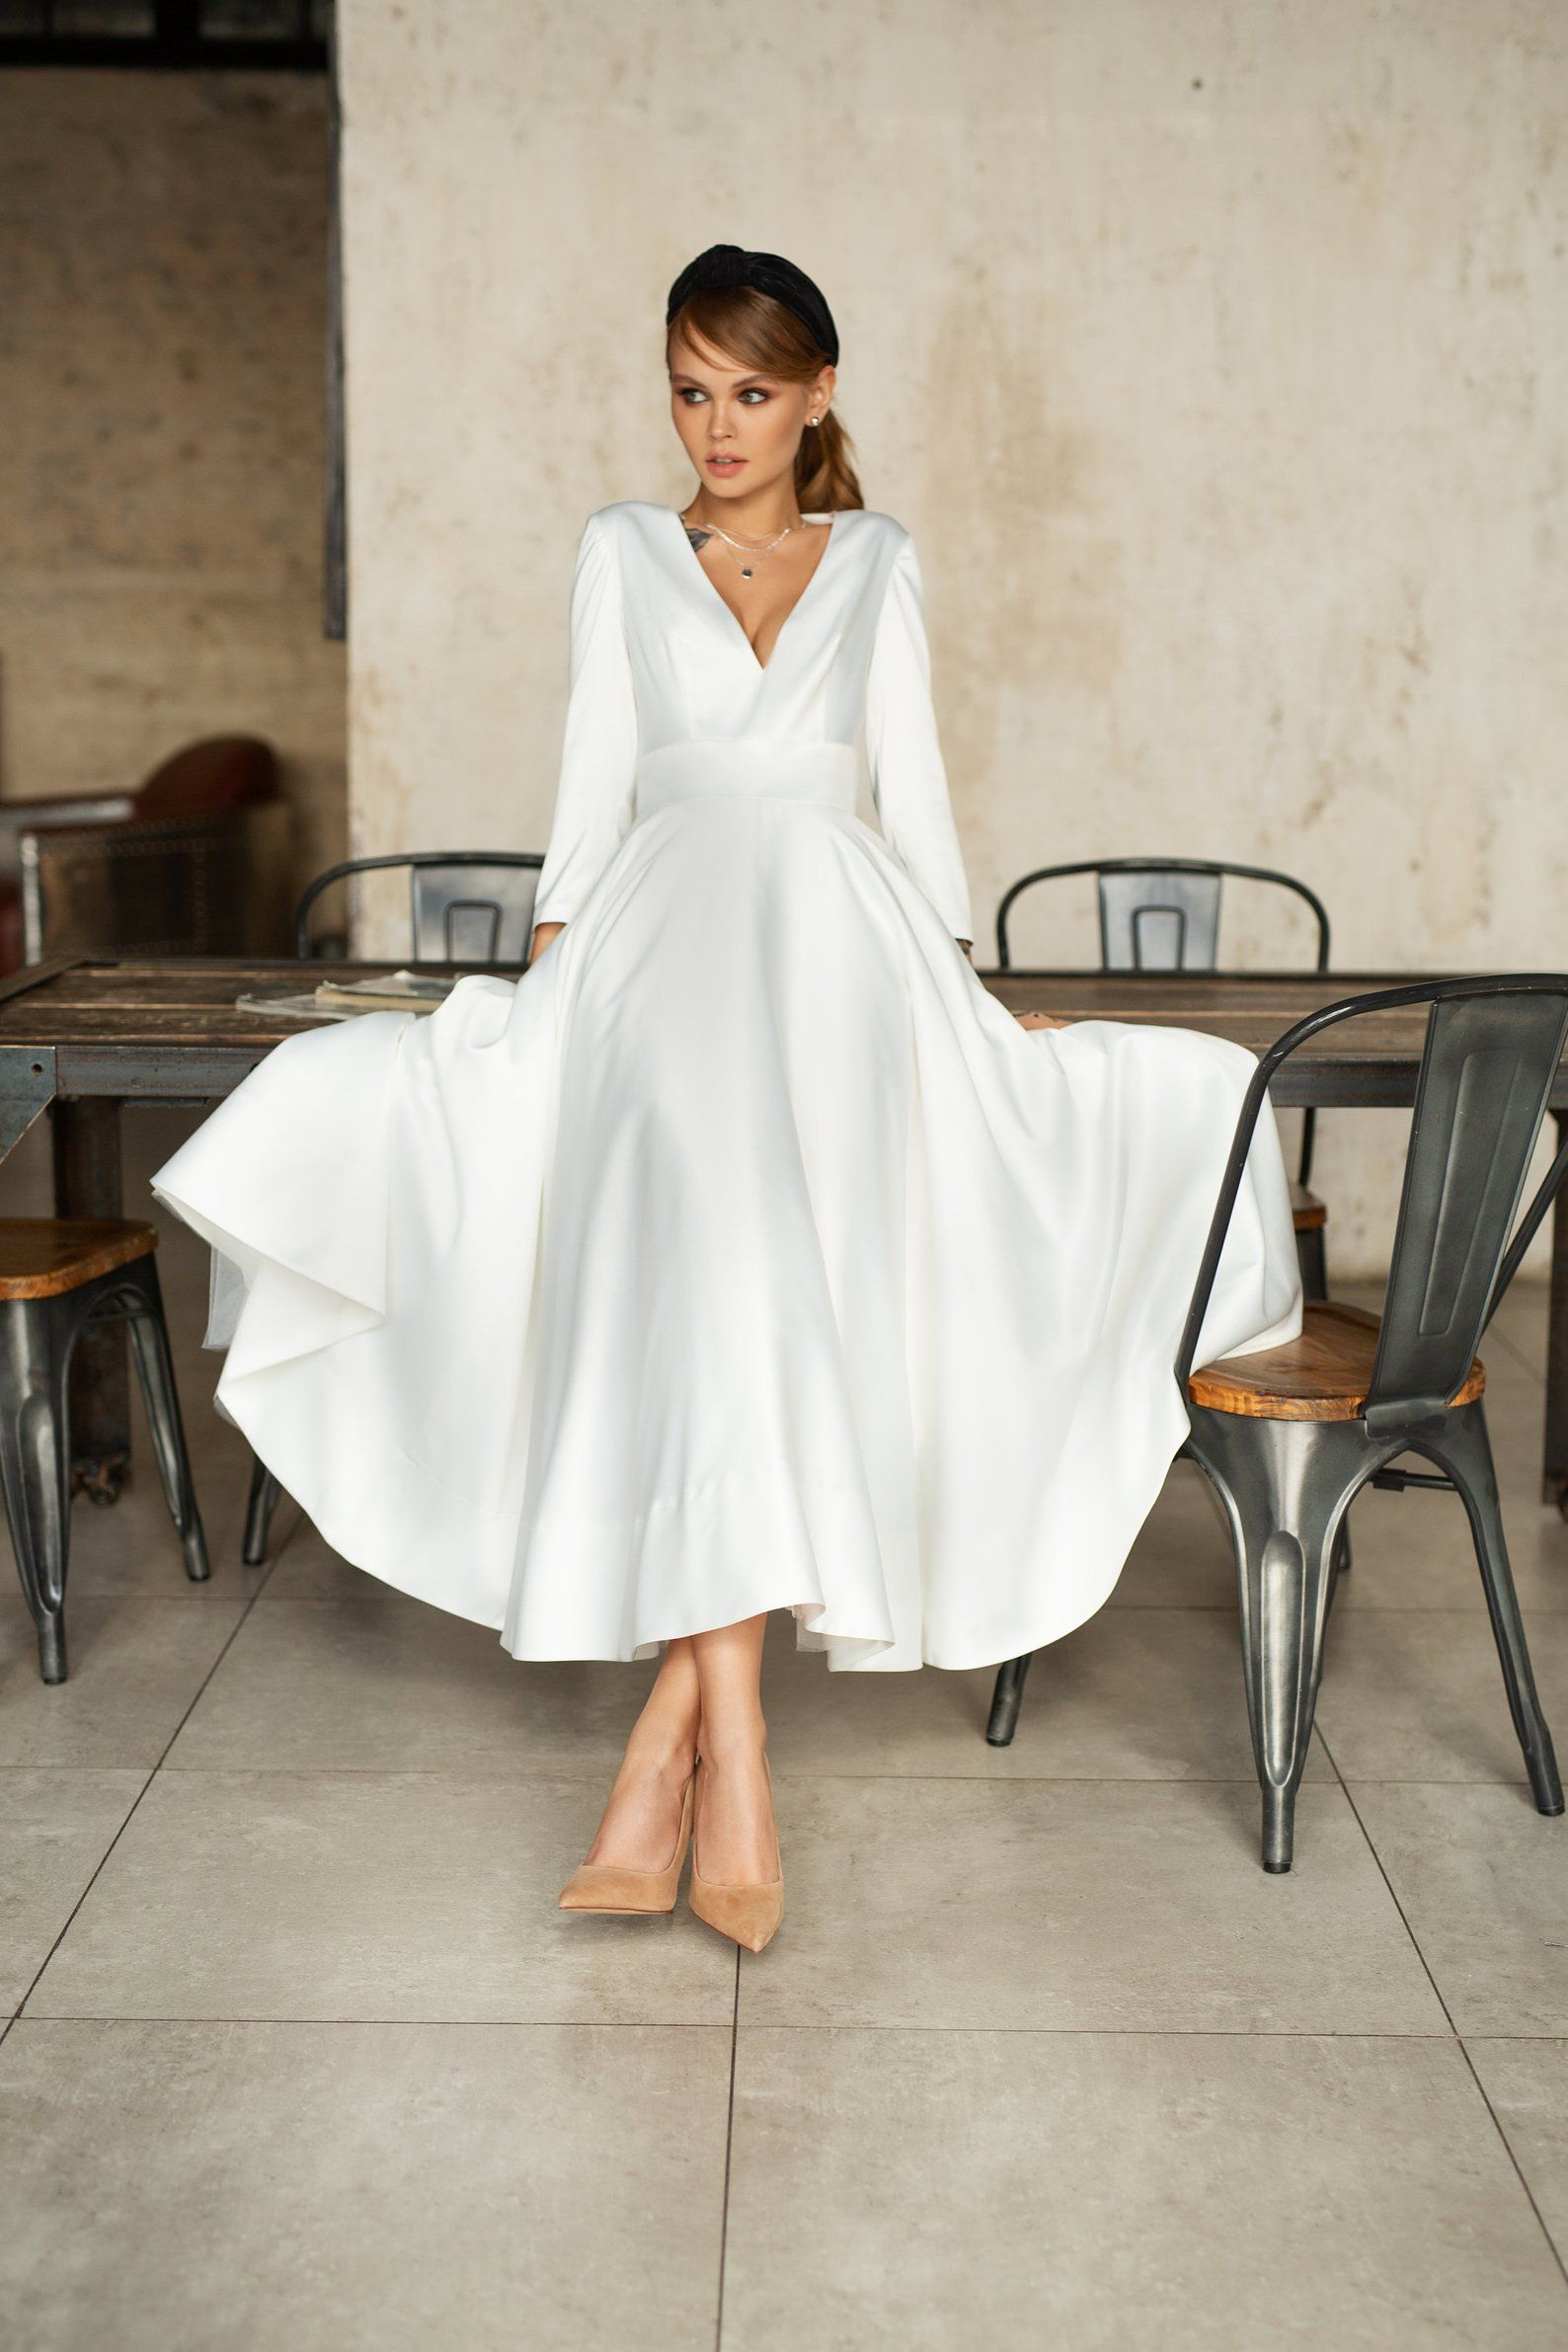 Minimalist Wedding Dress Modern Bridal Gown Reception Etsy Shower Dress For Bride Minimalist Wedding Dresses Bridal Shower Dress [ 2382 x 1588 Pixel ]